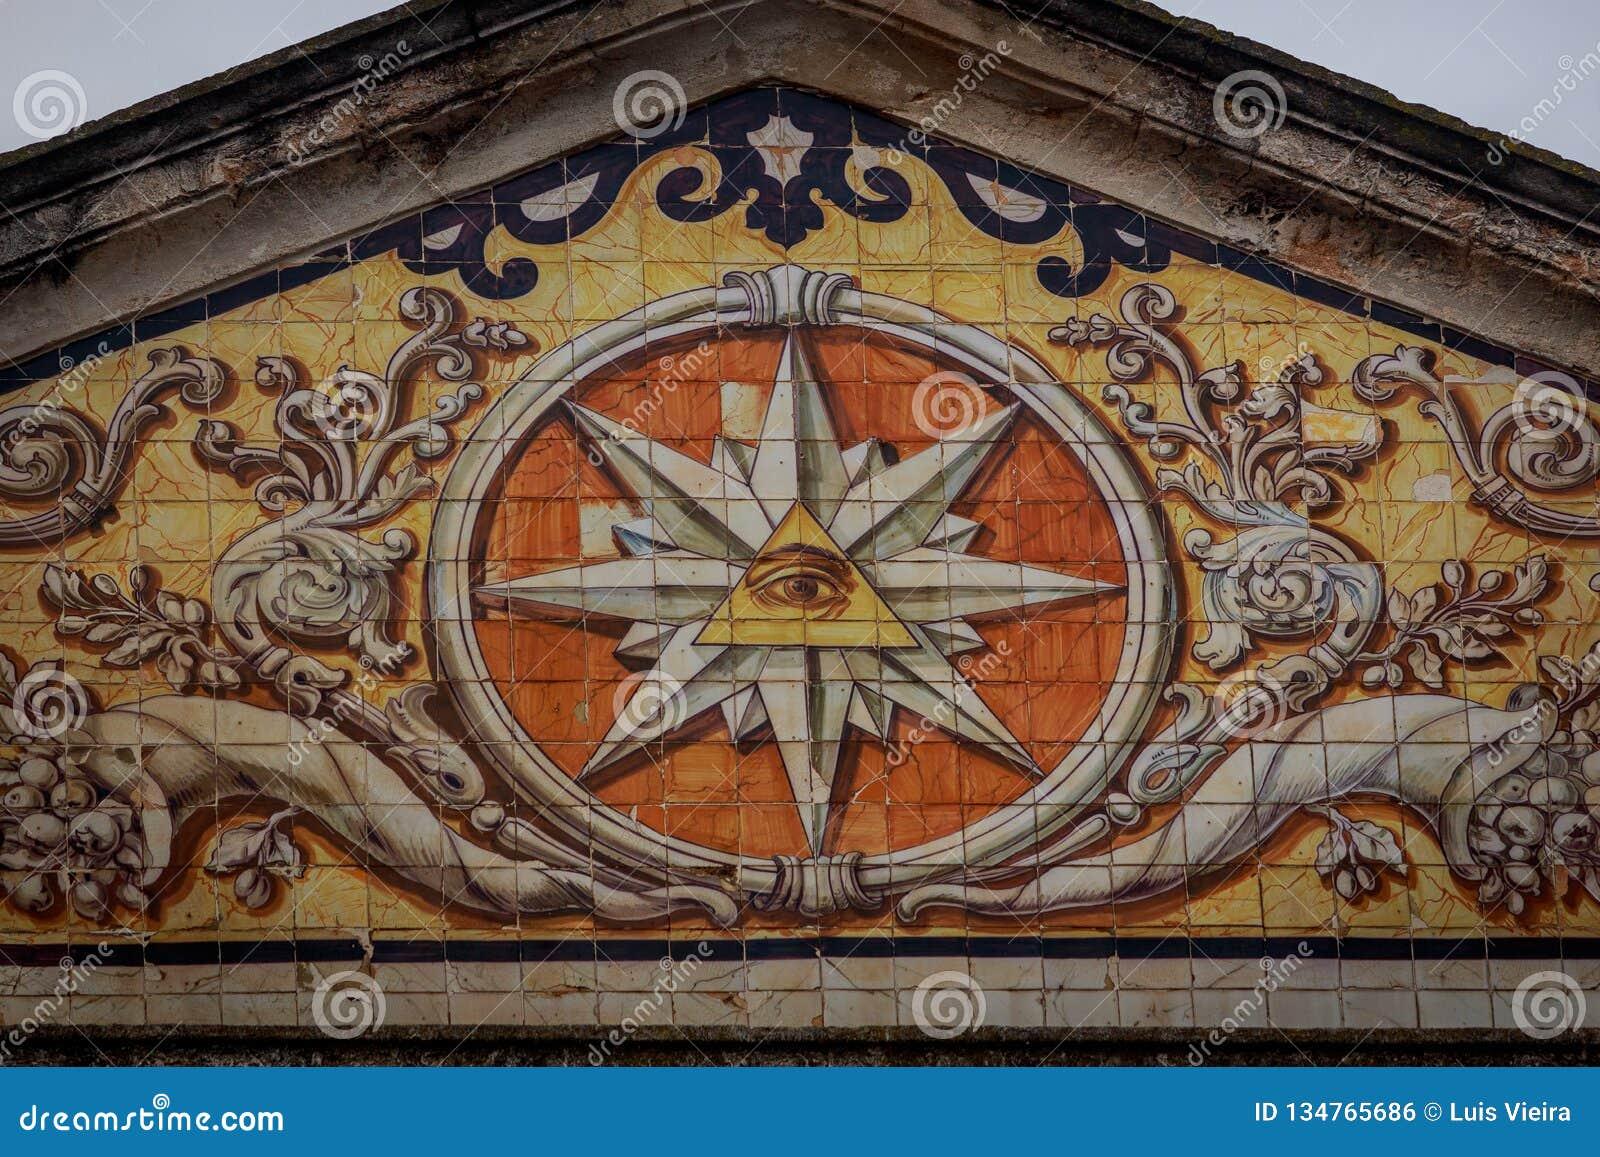 Eye of providence, freemasonry